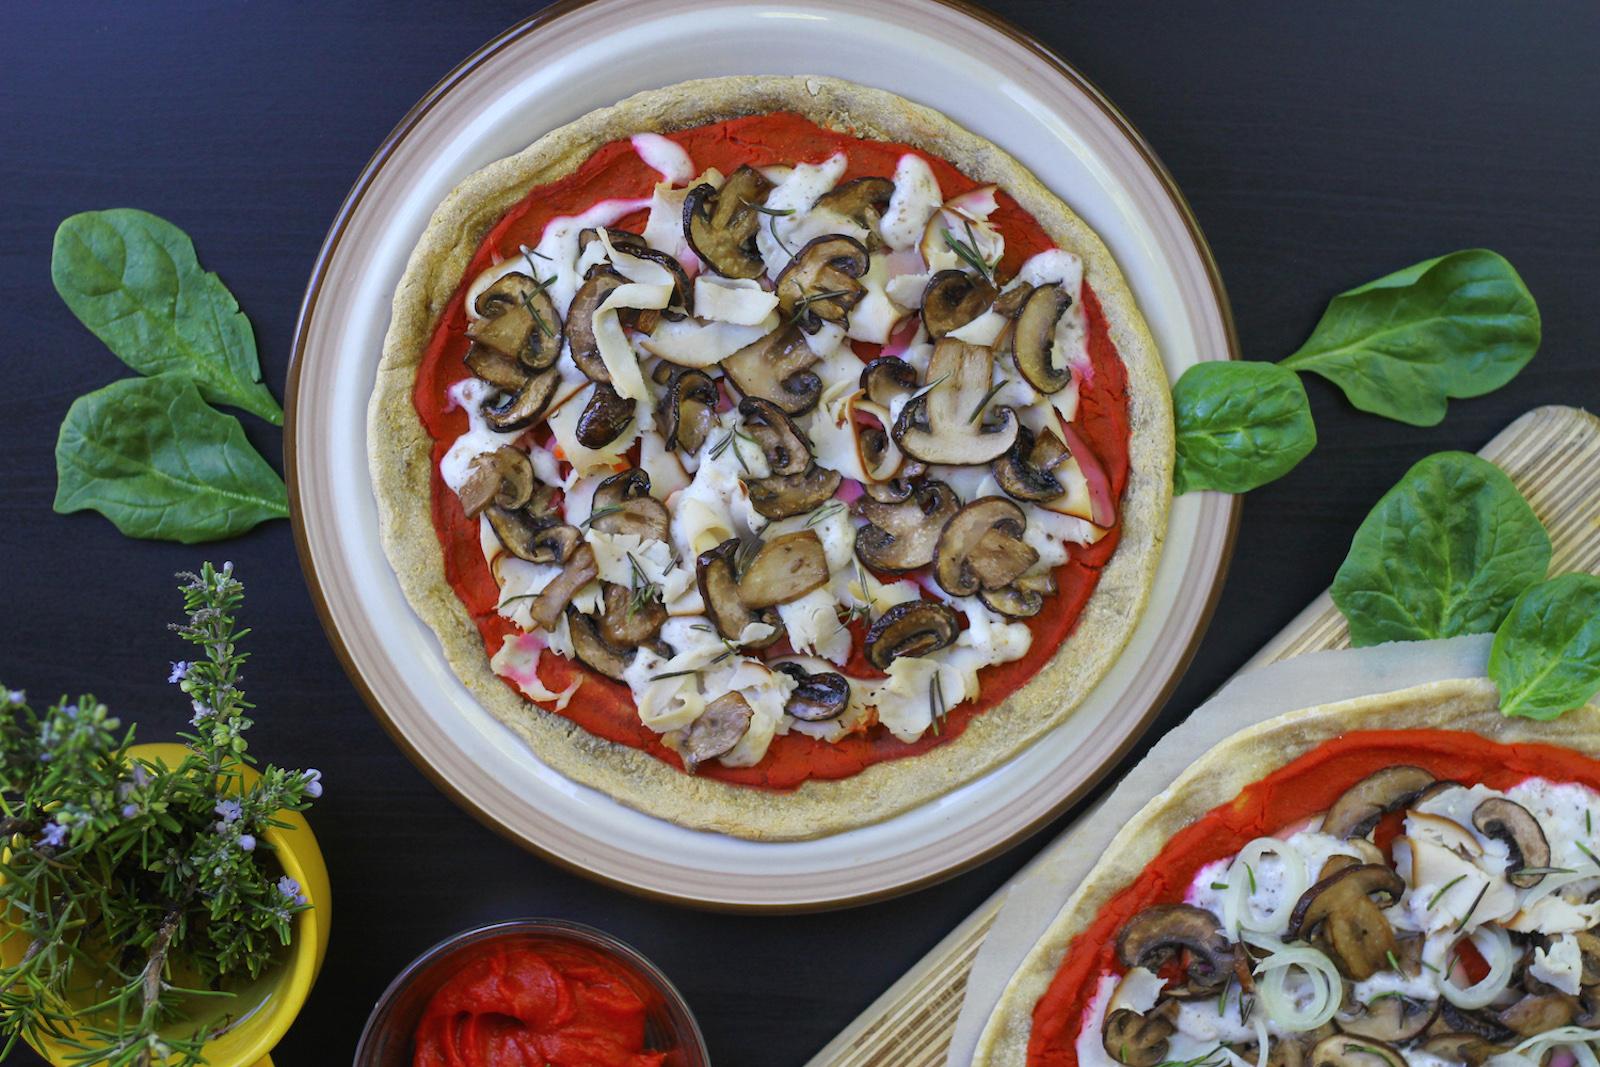 AIP Italian Pizza - AIP Italian Food Recipes from the AIP Italian Cookbook 2